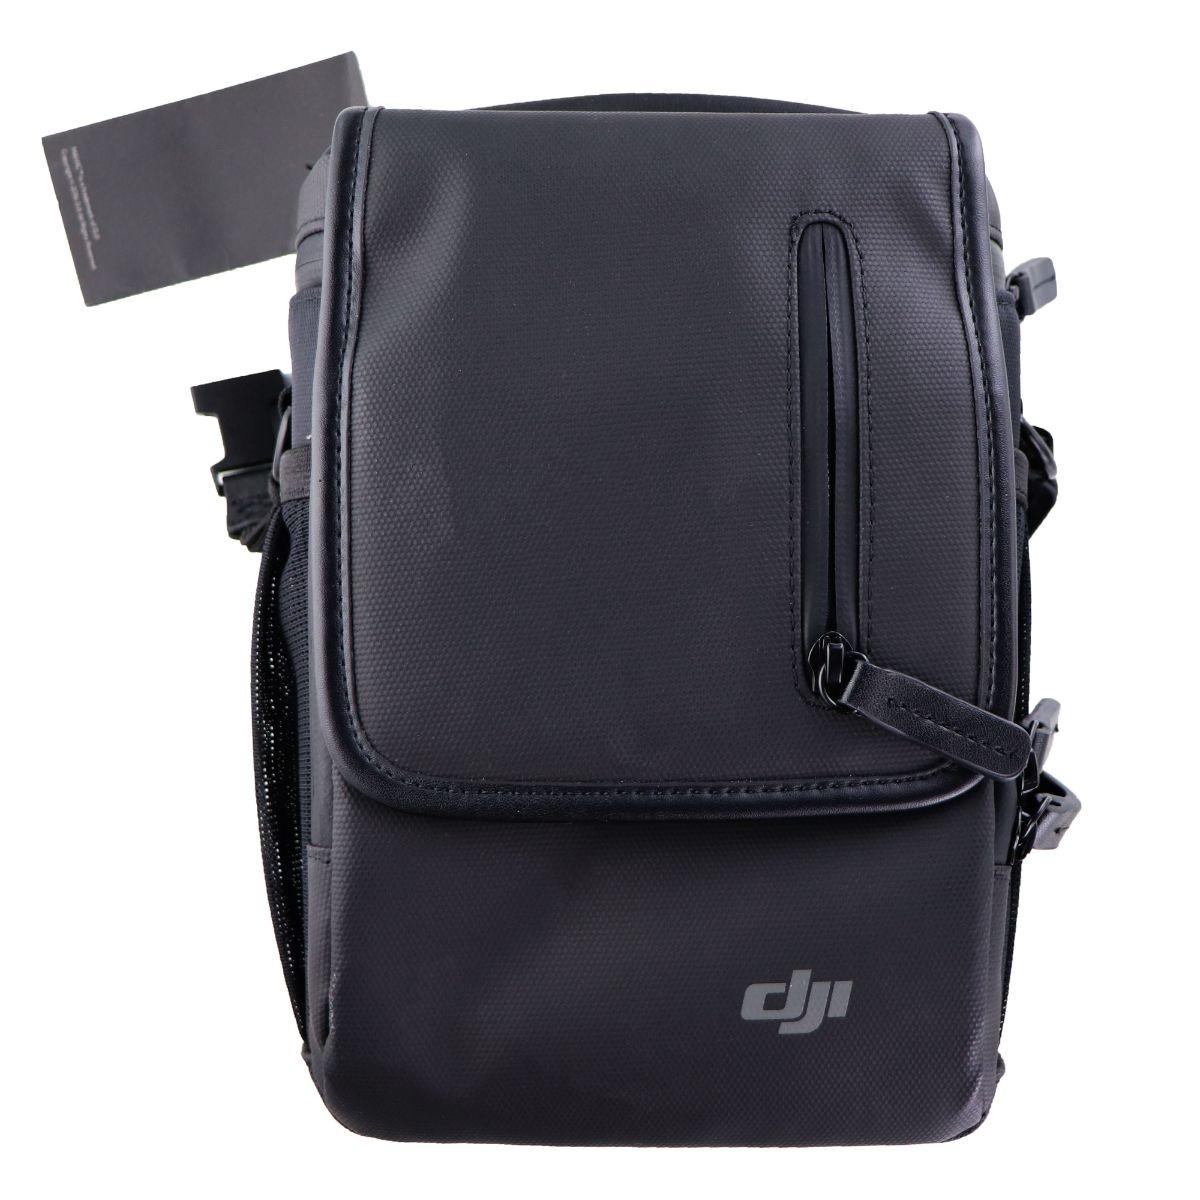 DJI Mavic 2 Shoulder Bag Part 21 for Mavic 2 Pro and Mavic 2 Zoom - Black